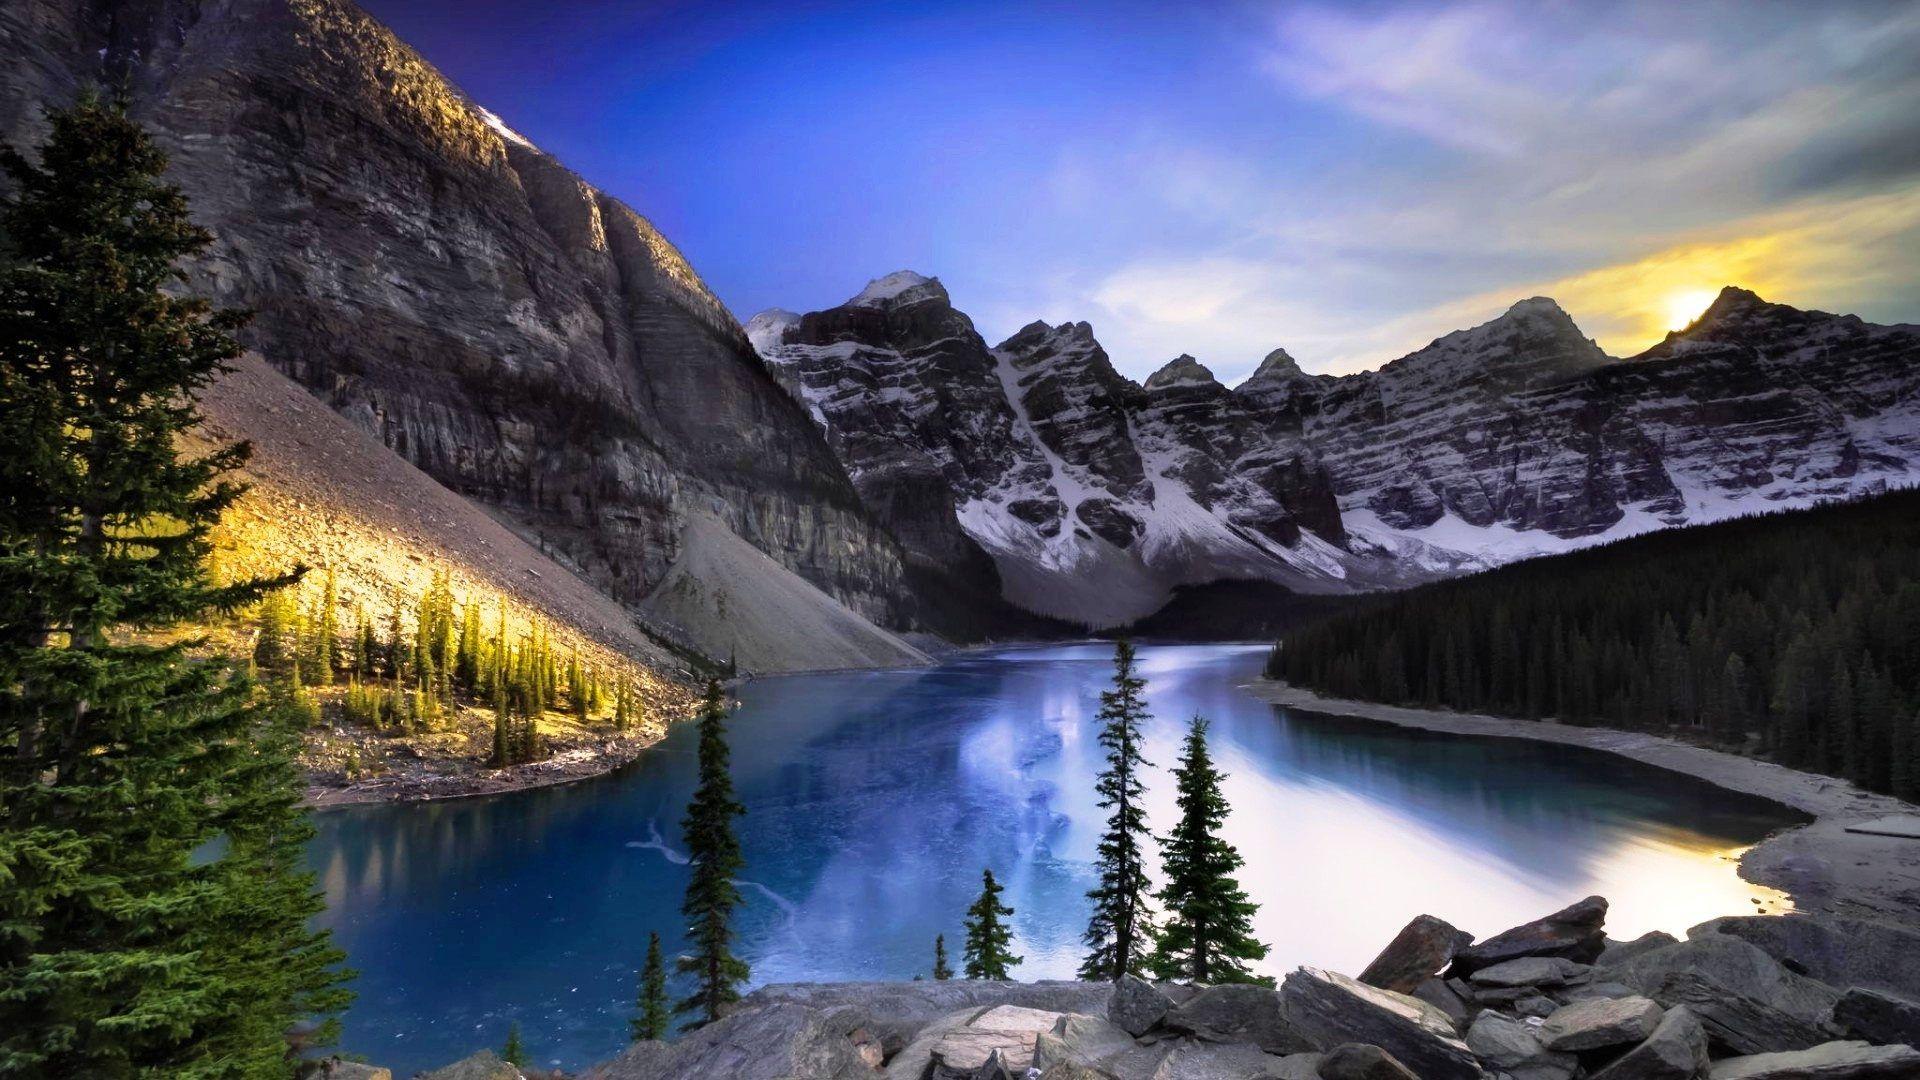 Banff National Park Scenery